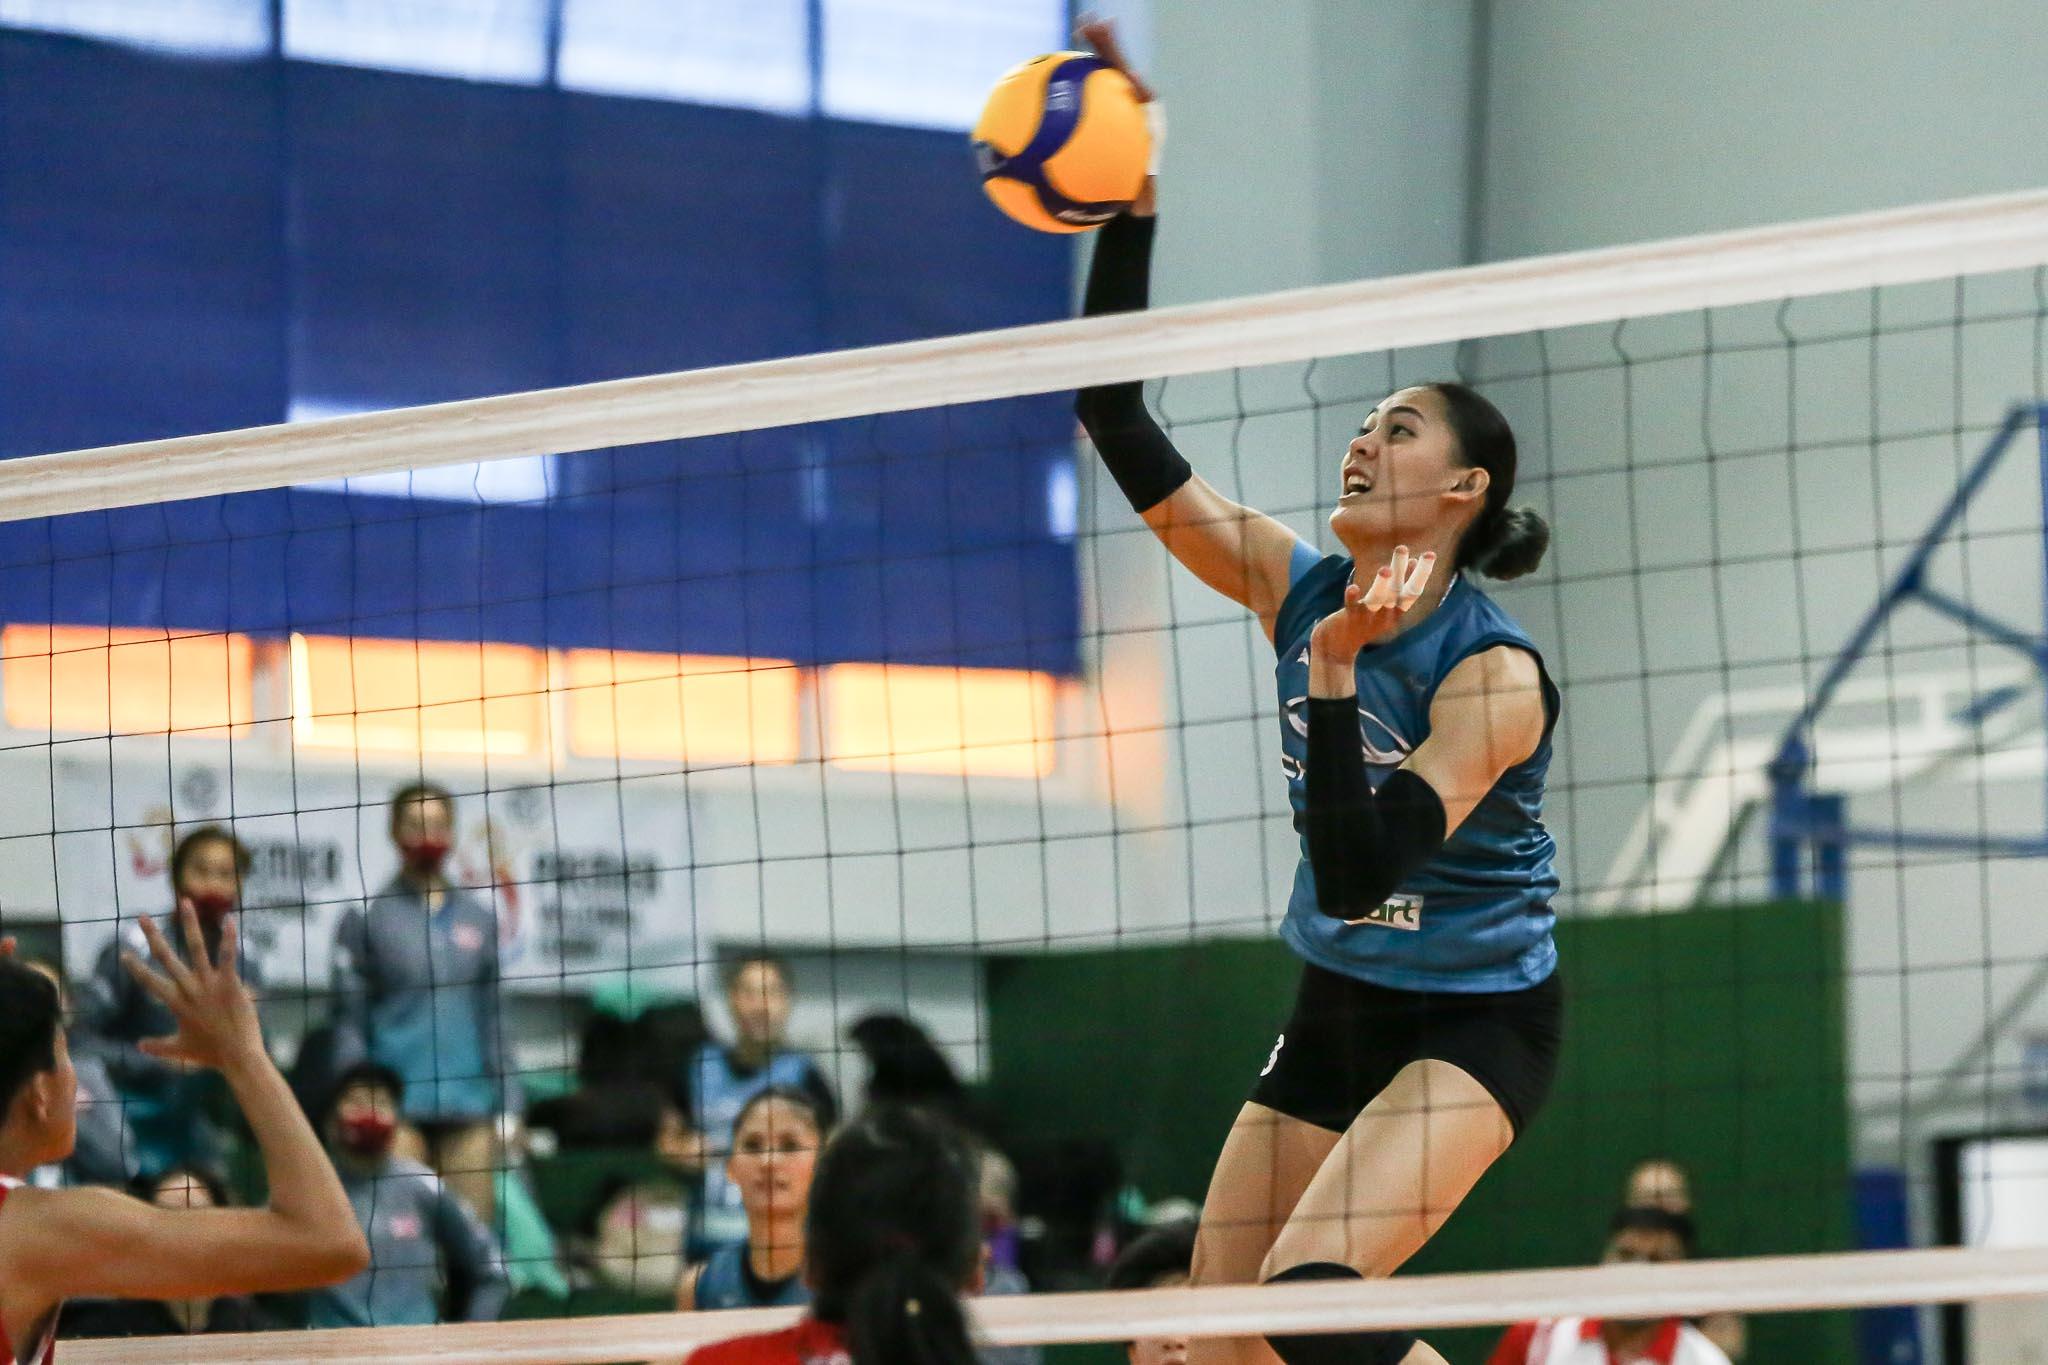 PVL-2021-Chery-Tiggo-vs-PLDT-Jaja-Santiago-Chery Jaja Santiago vows to find Ageo form for Chery Tiggo News PVL Volleyball  - philippine sports news